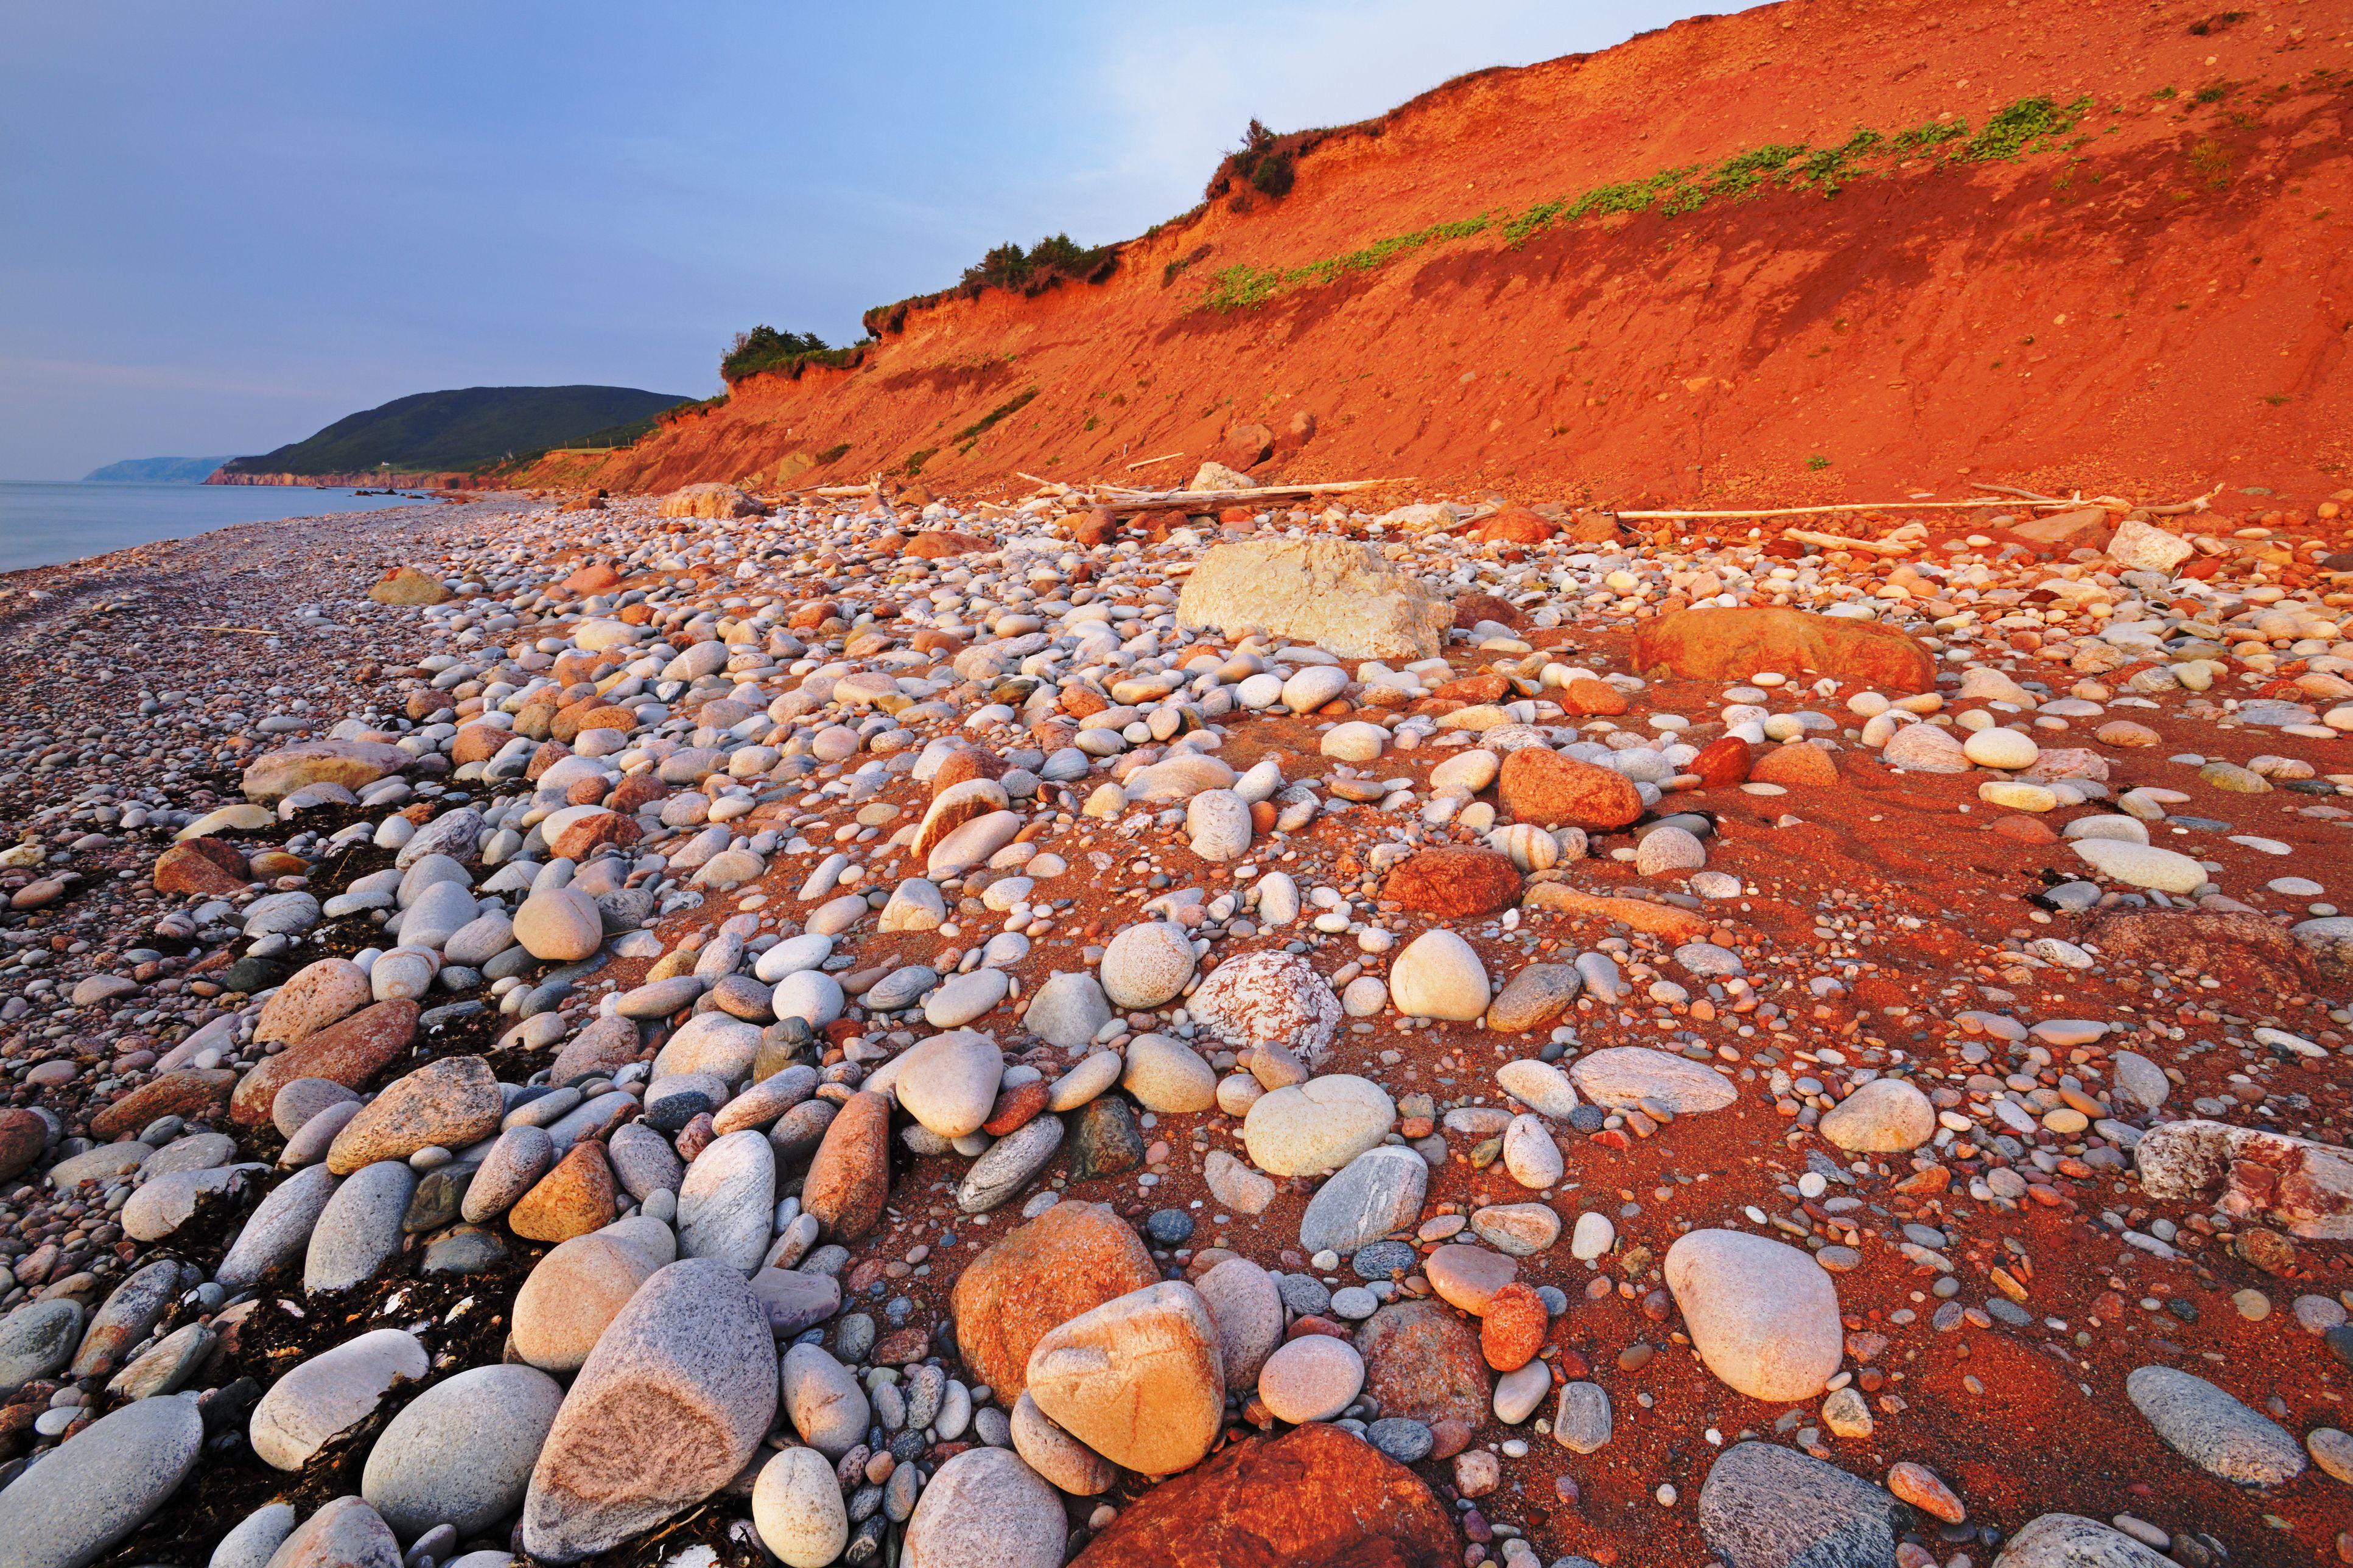 Rocky shoreline at sunset, Pleasant Bay, Cape Breton Island, Nova Scotia, Canada